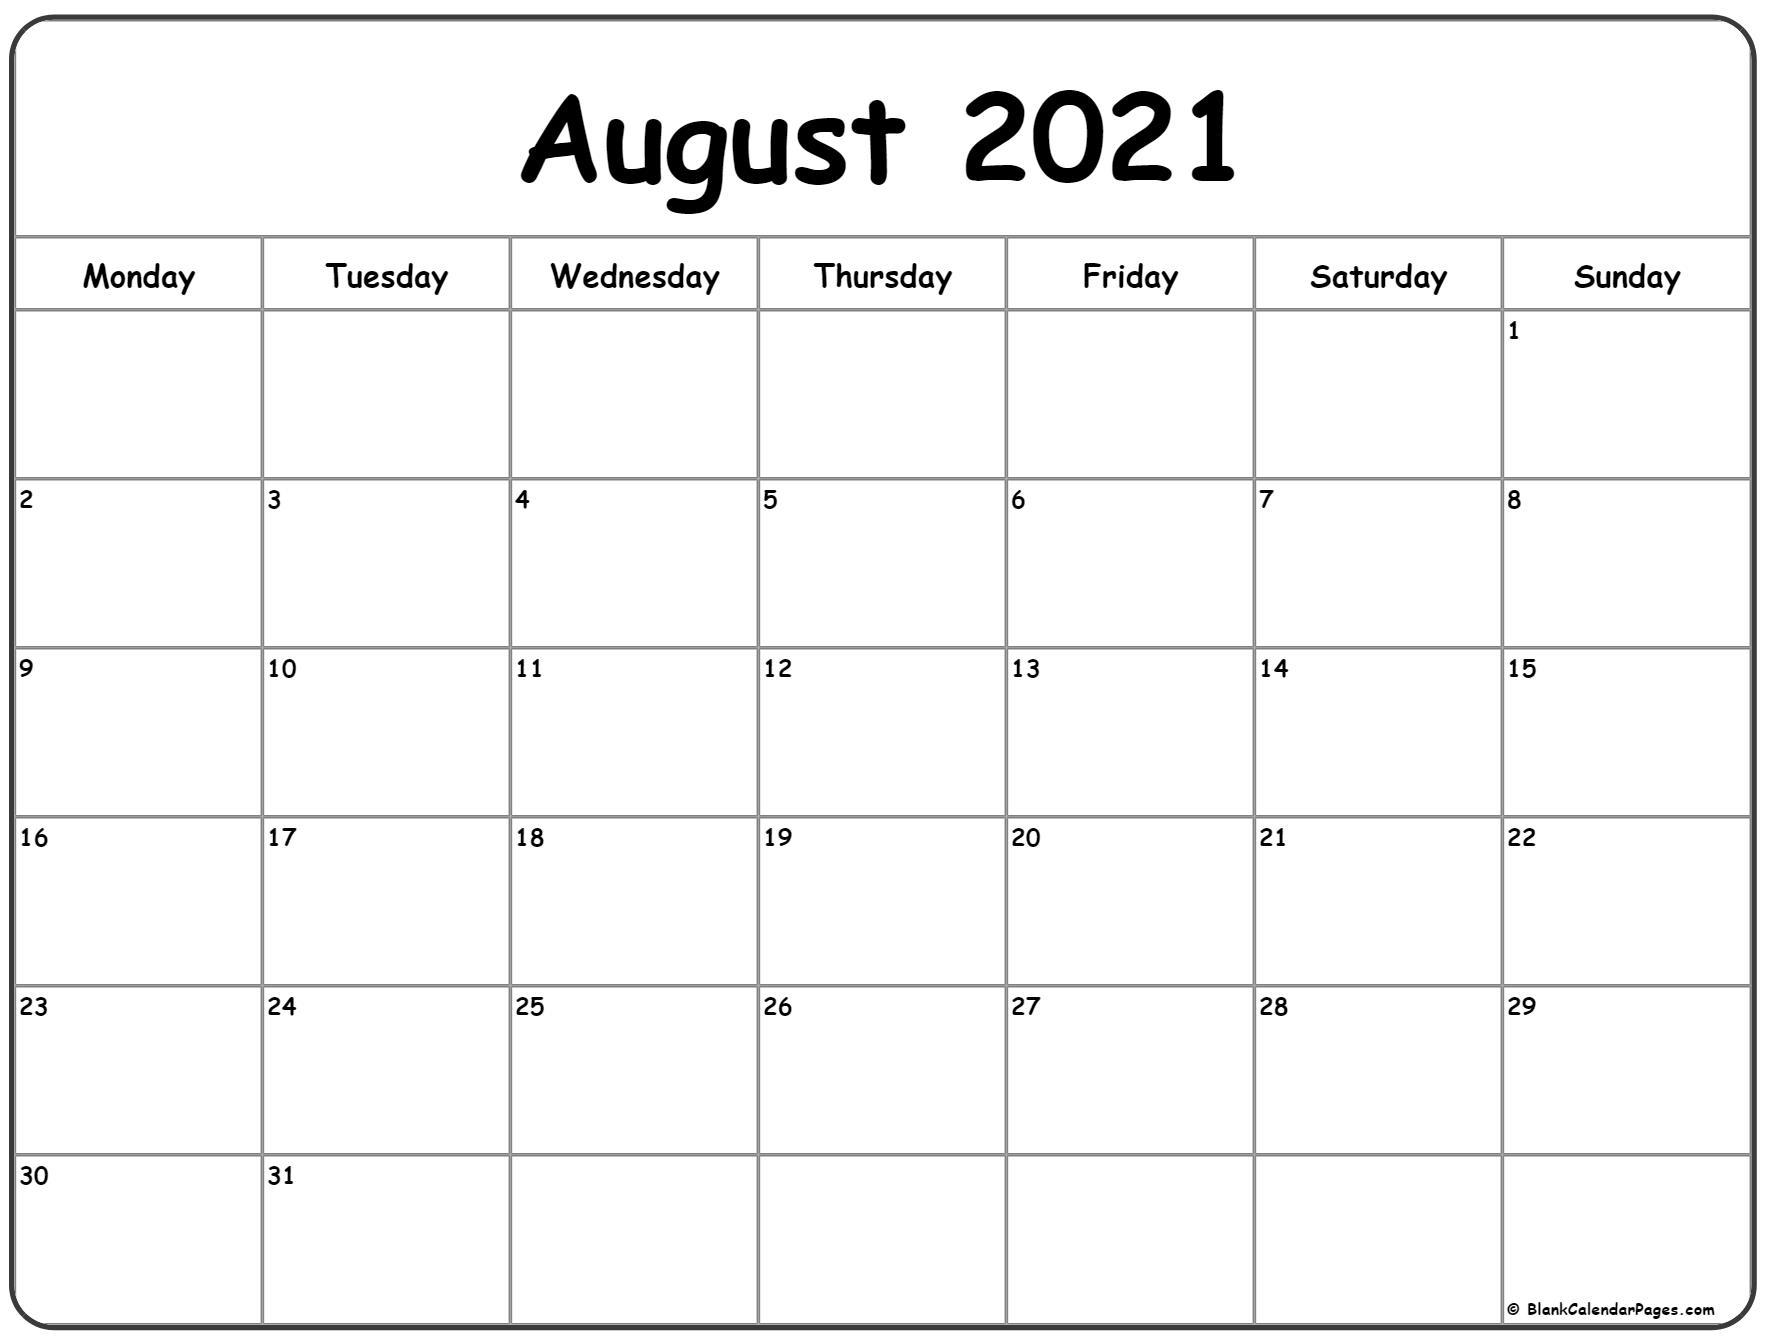 Pick August 2021 Monday To Sunday Calendar